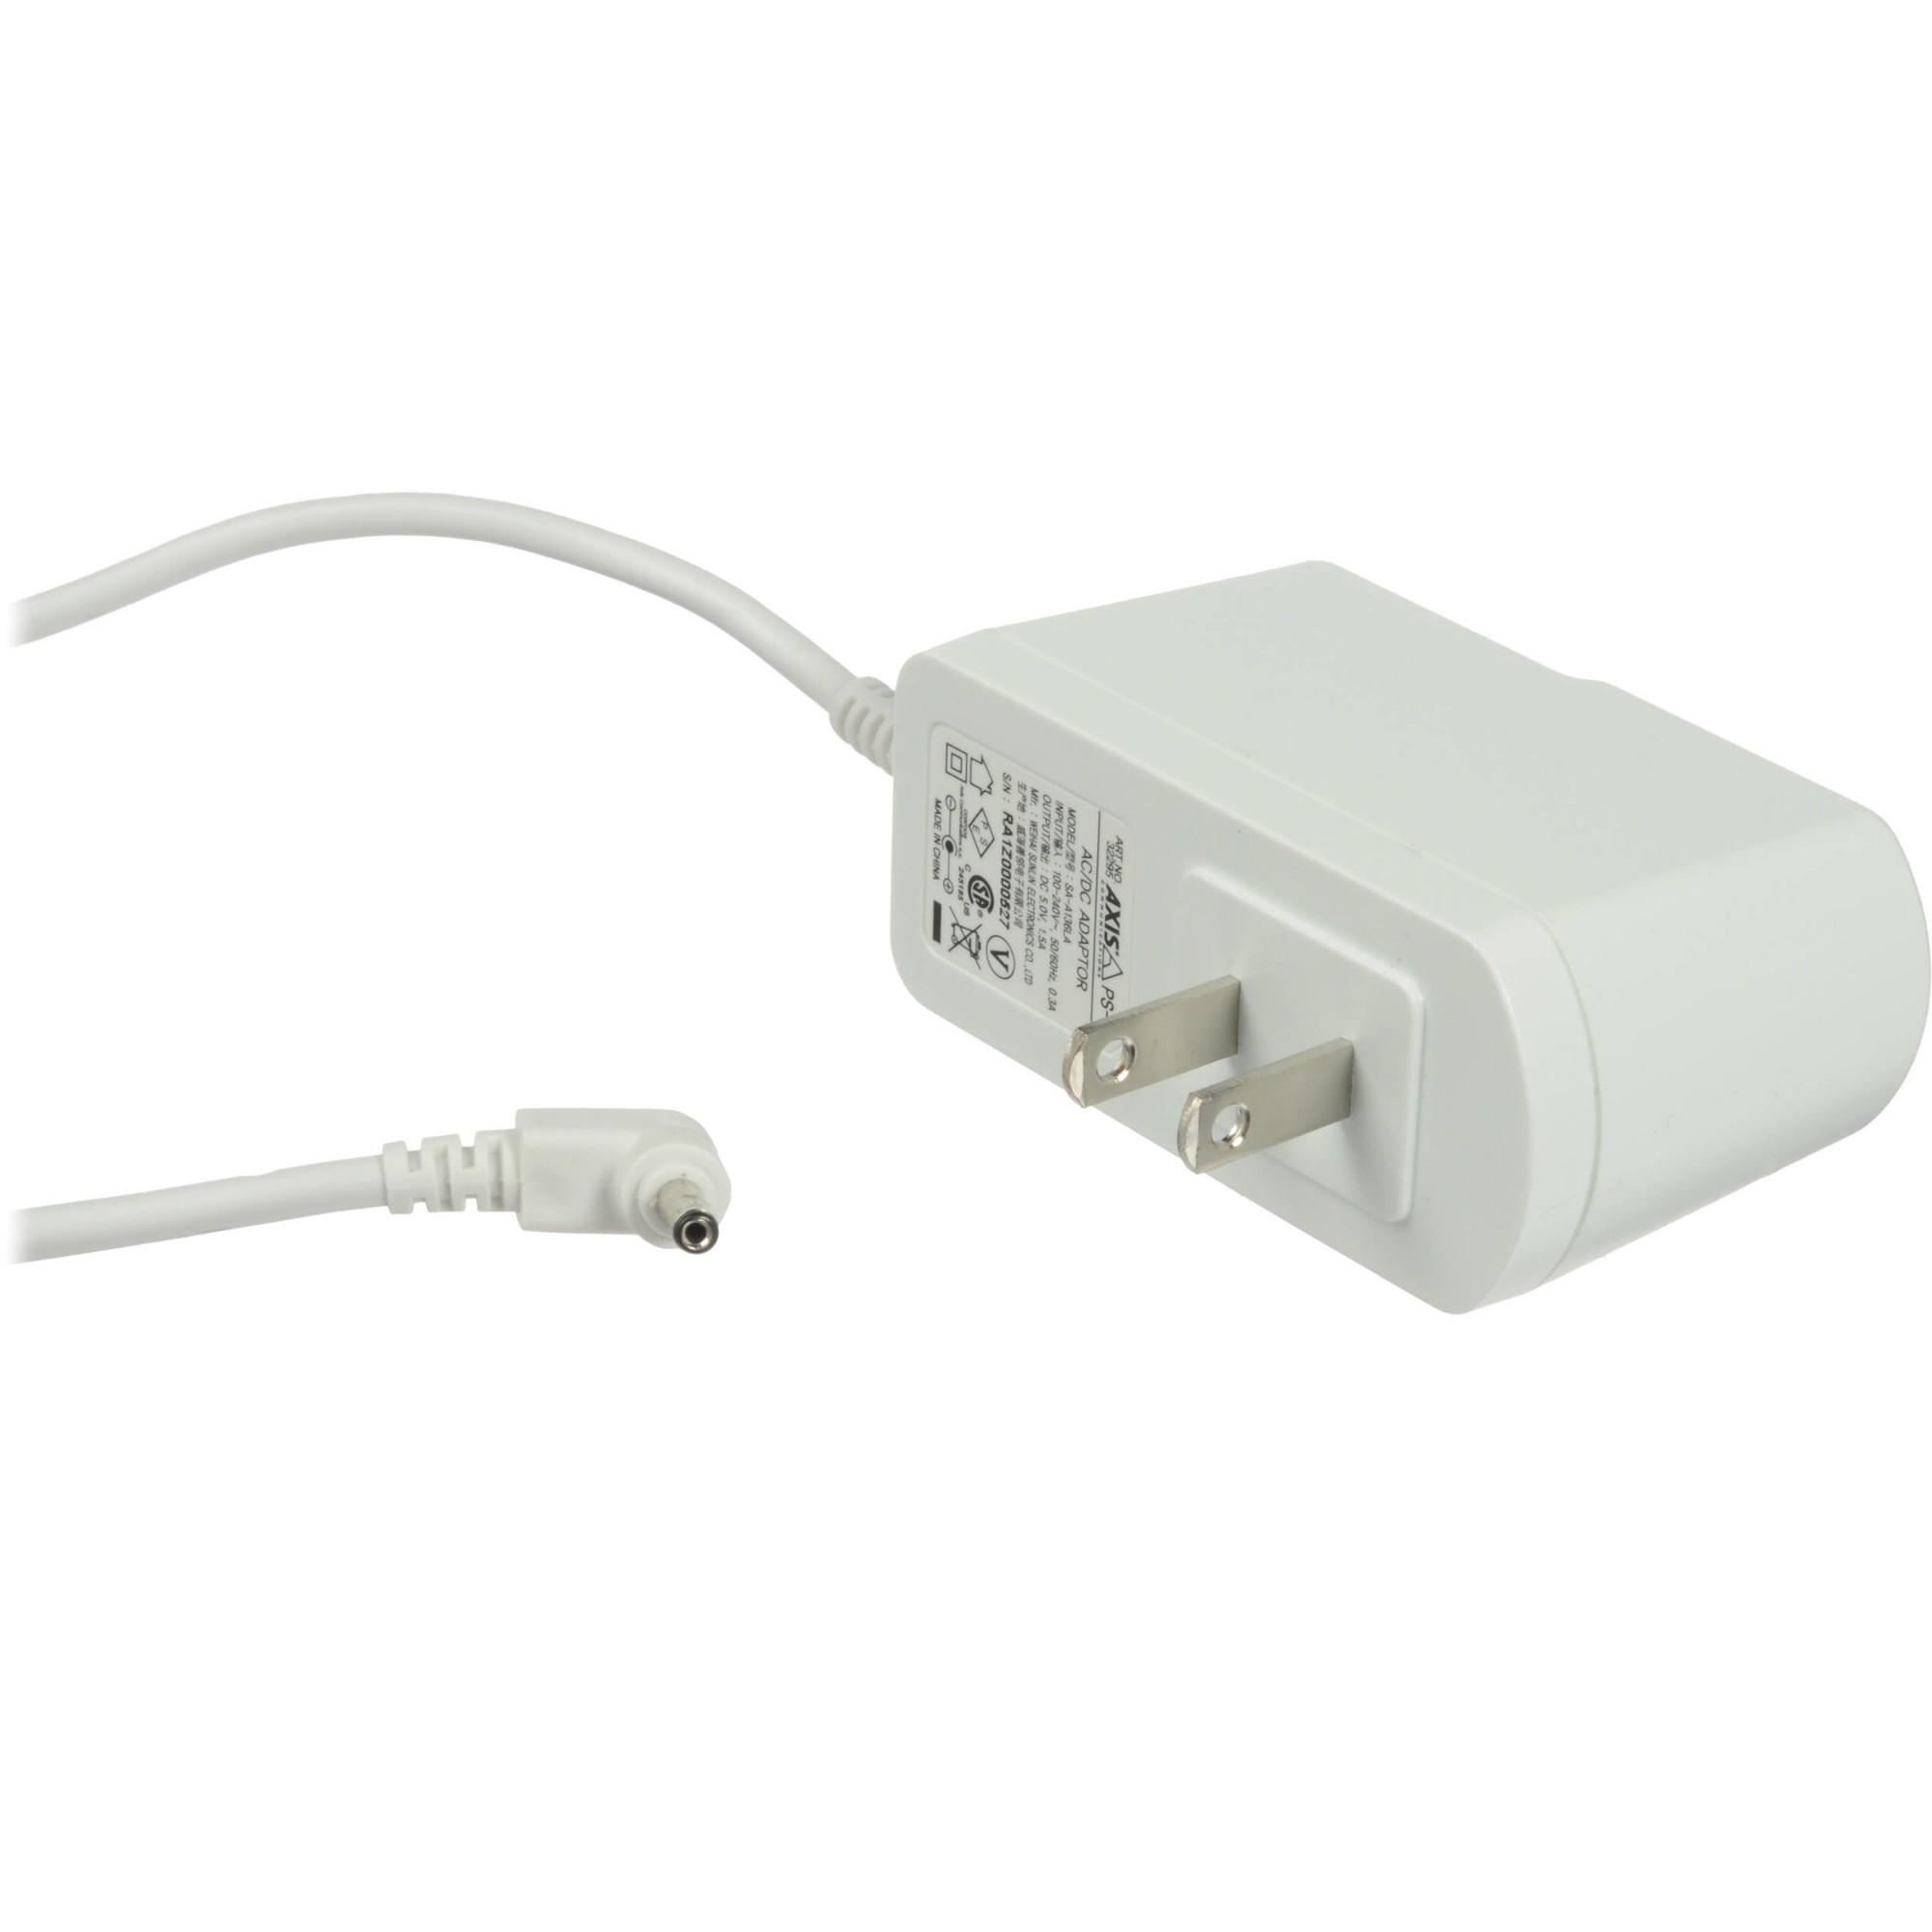 Axis 5700-221 Indoor White power adapter & inverter